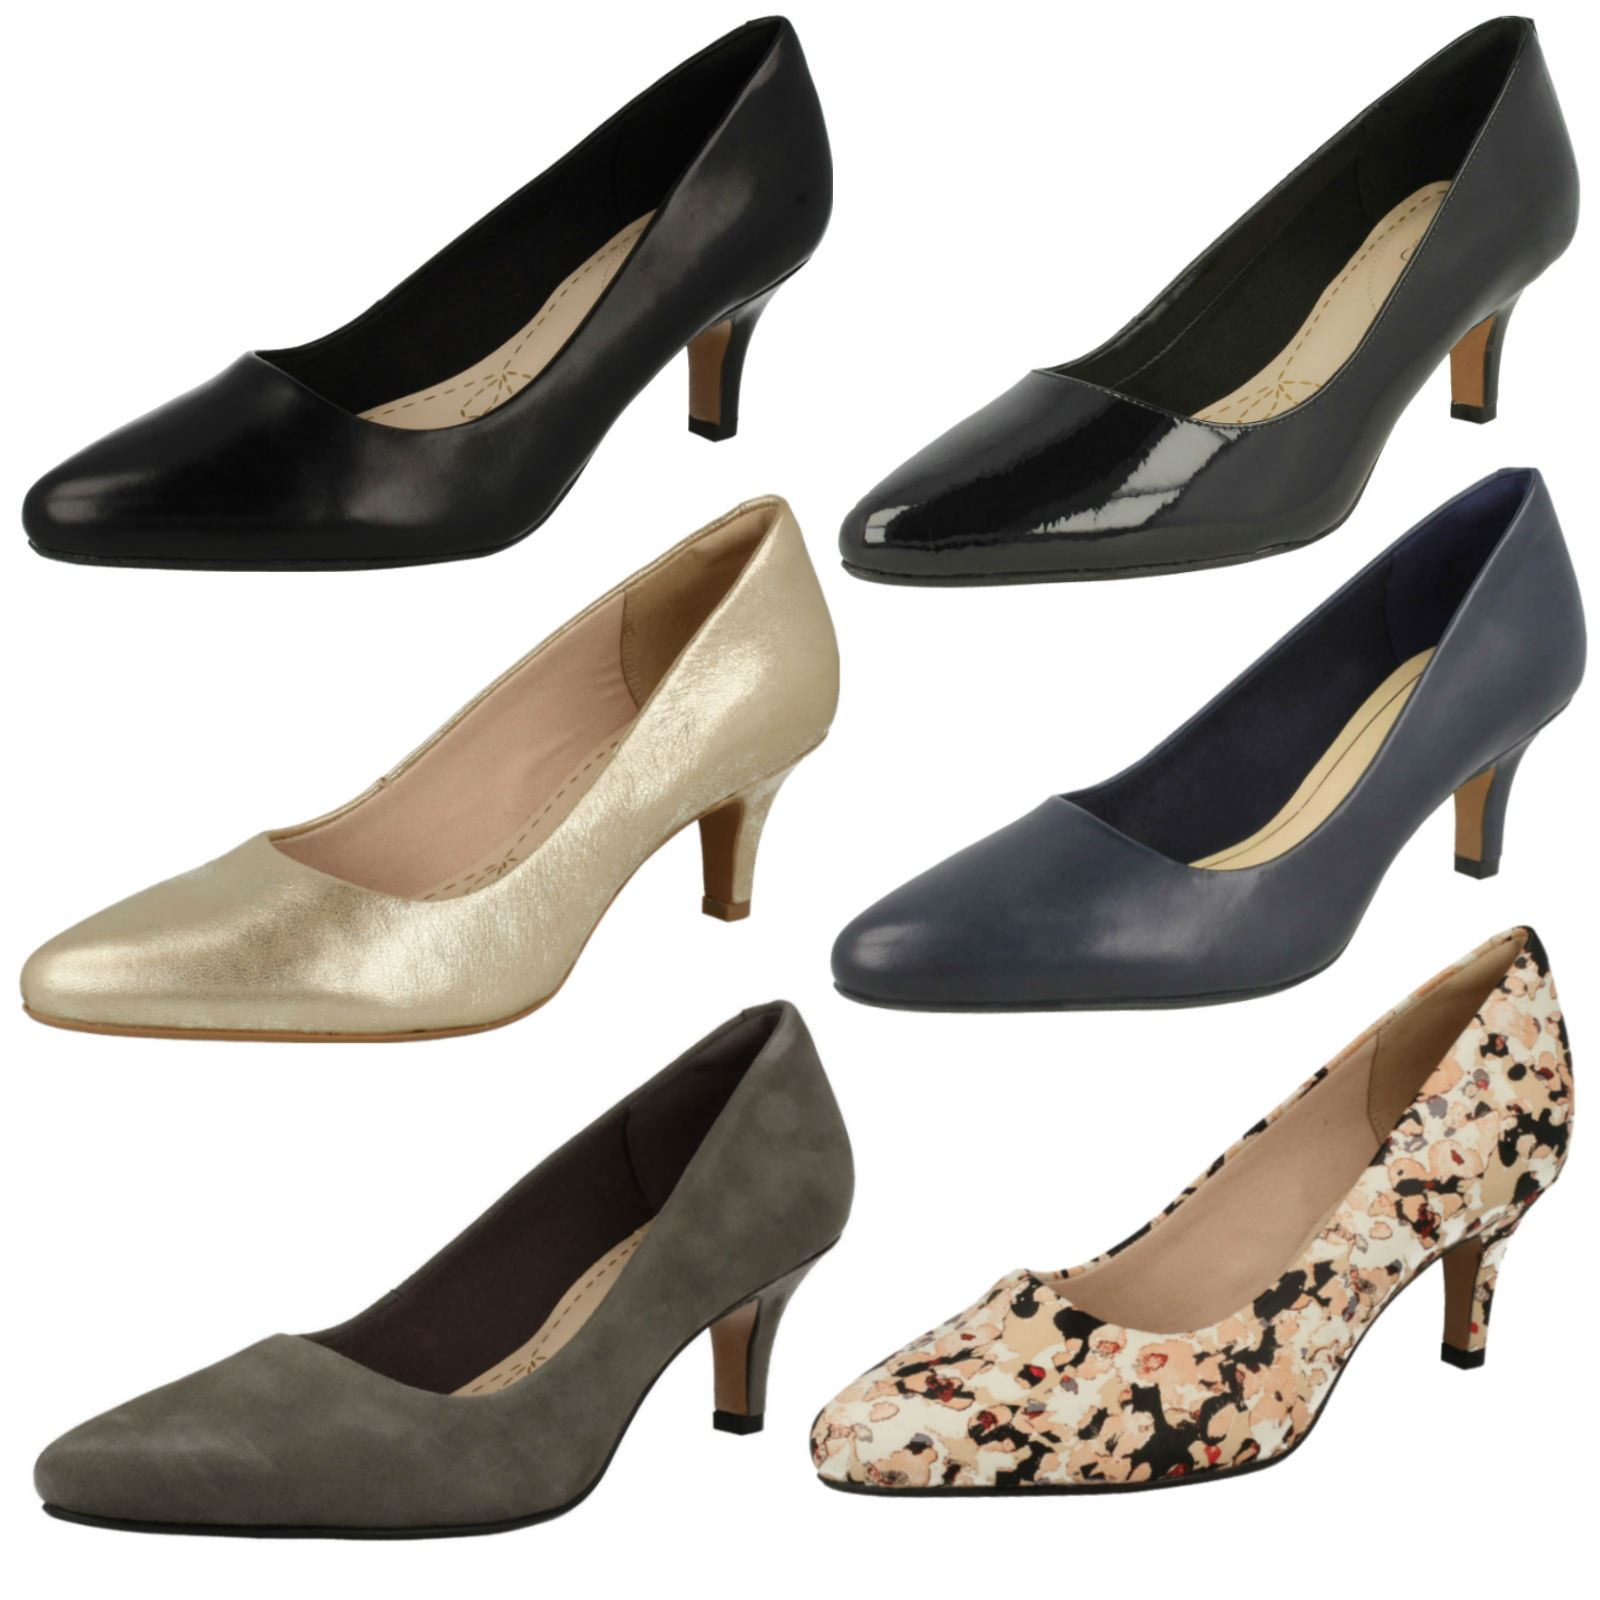 Ladies Clarks Leather Slip On Smart Court Shoes - 'Isidora Faye'